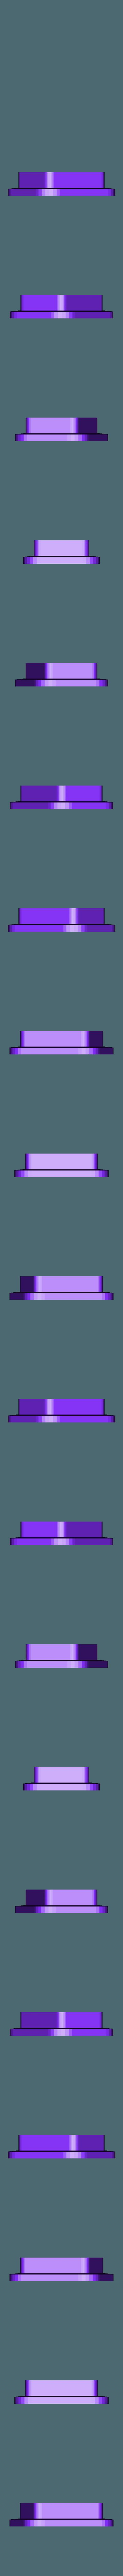 vitre_standart.STL Download STL file Caravan 3Places • 3D printable model, dede34500